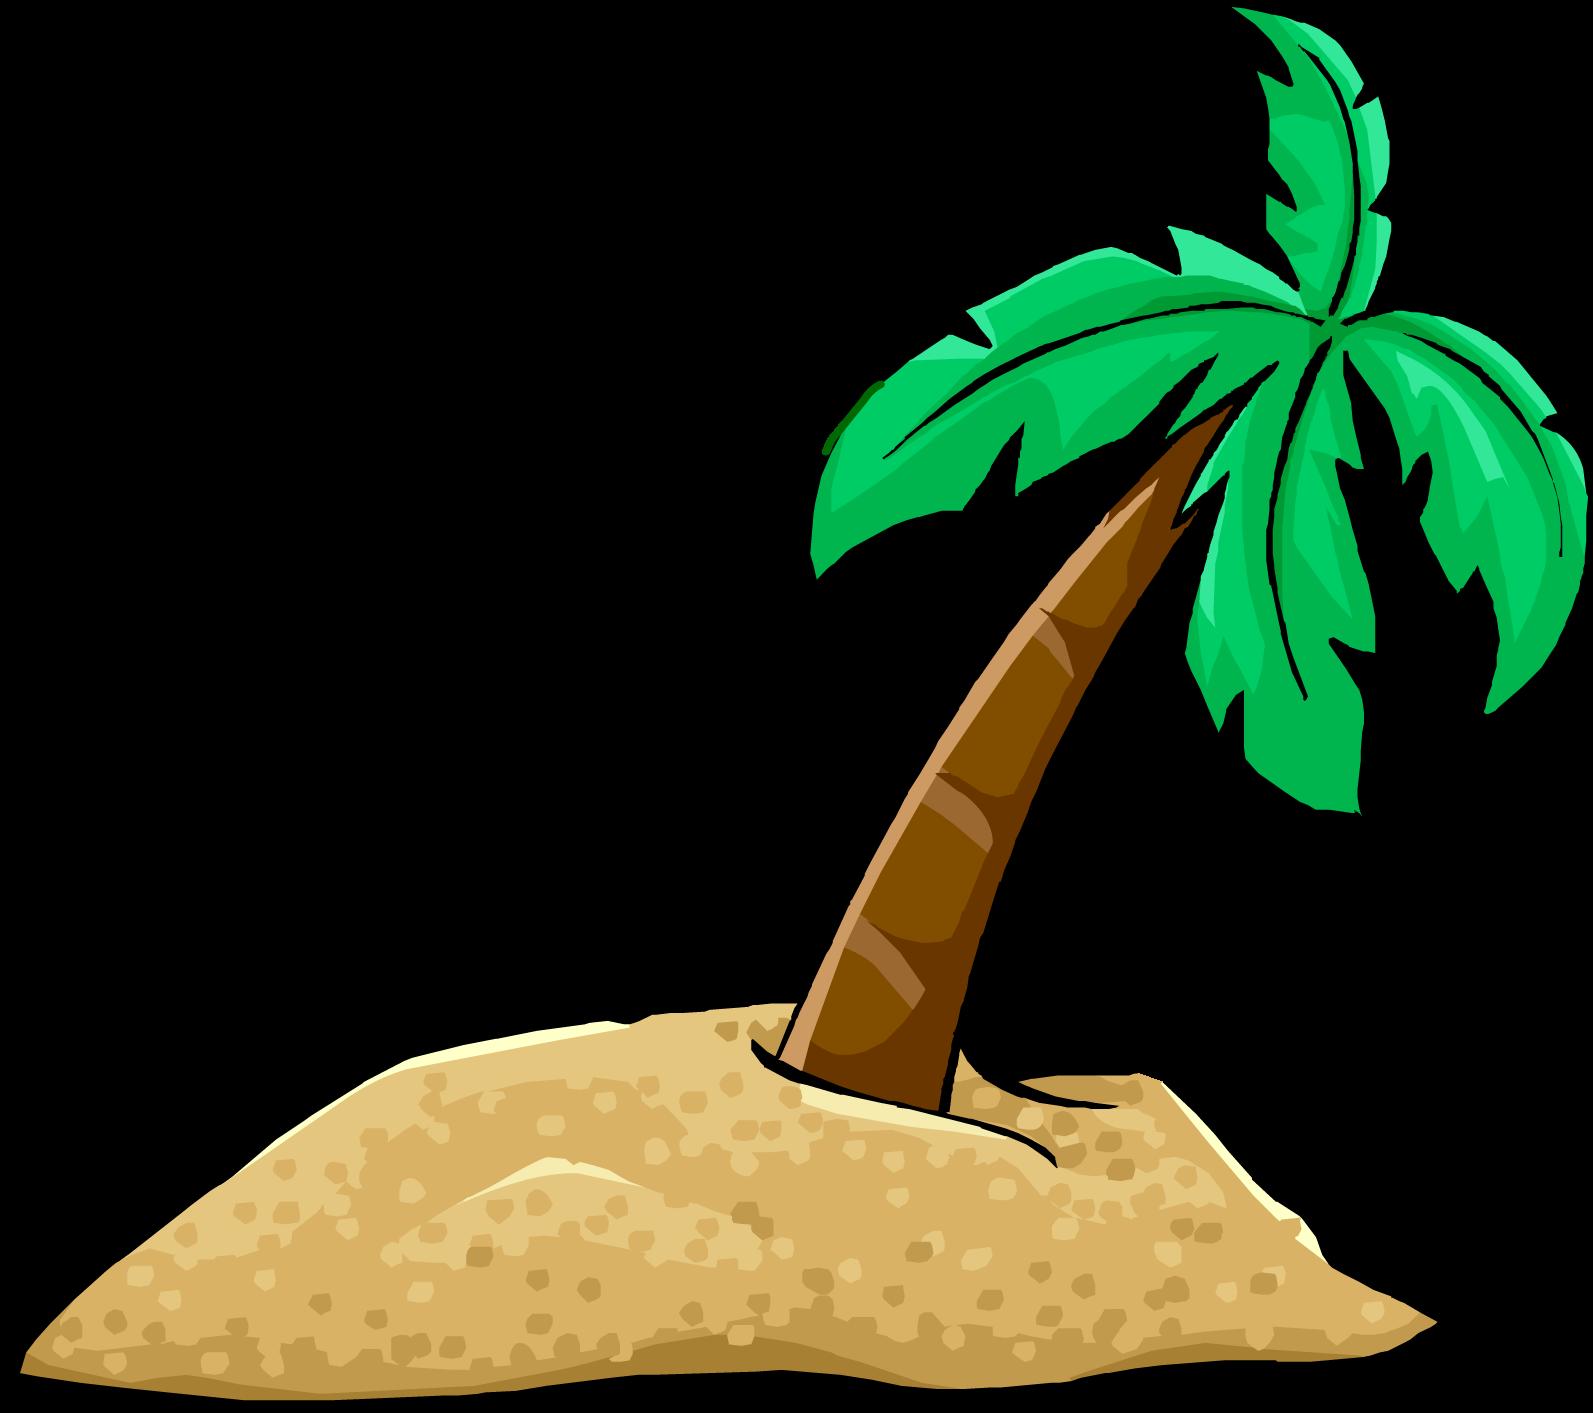 Island PNG - 1631